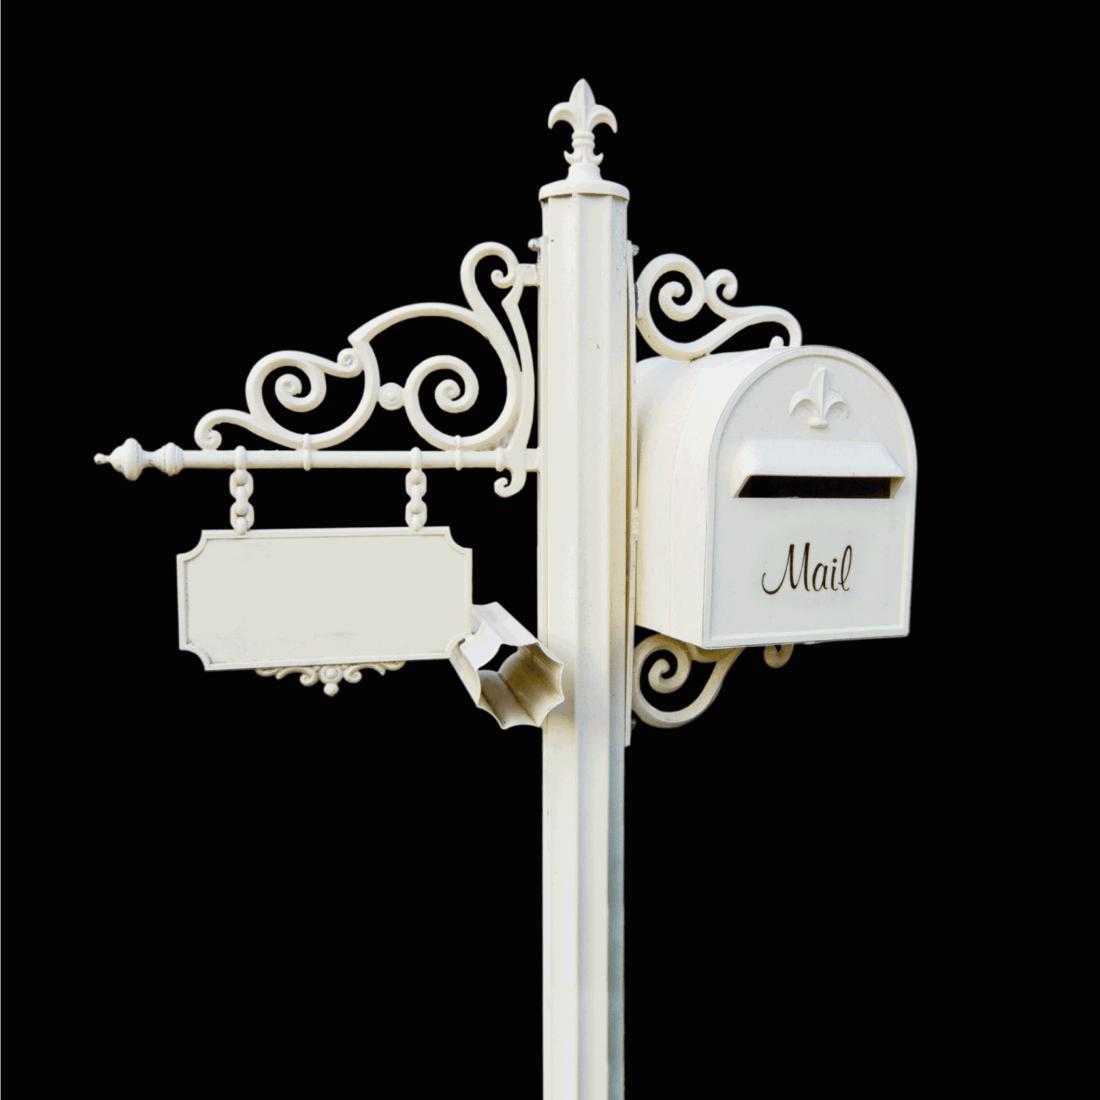 White ornamental Letter box